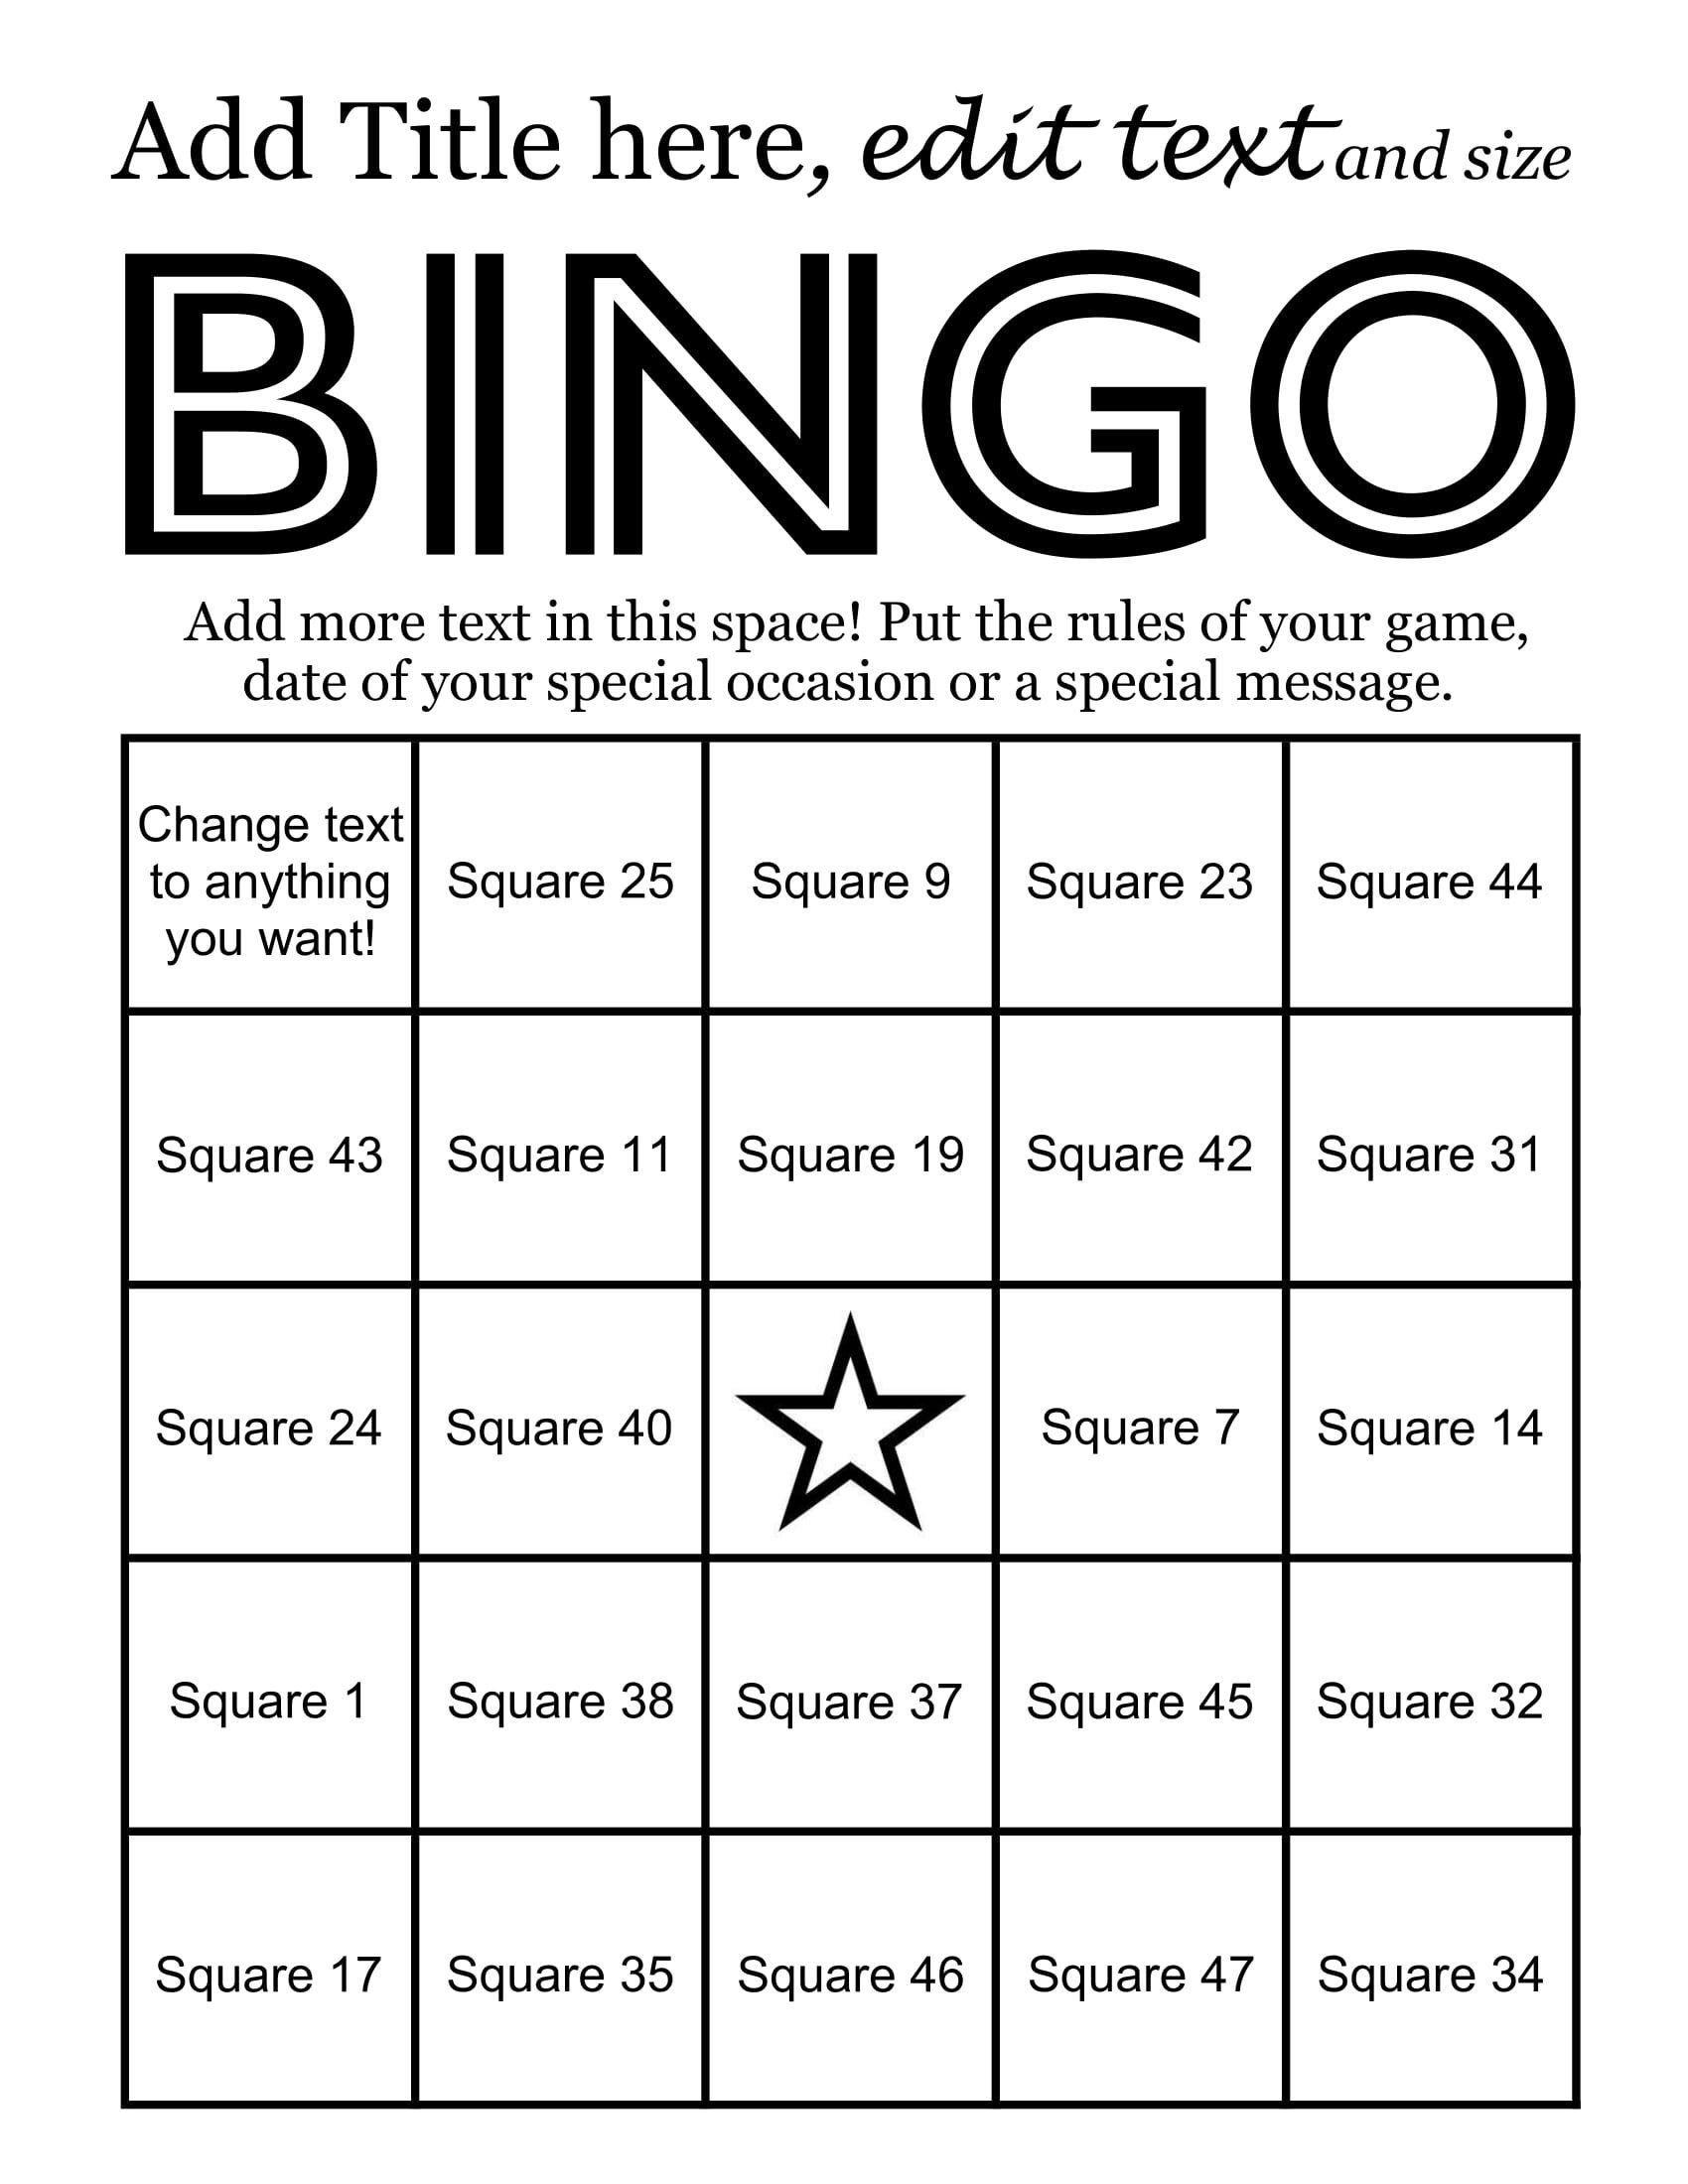 Bingo Card Maker makes 50 custom bingo cards 48 call items